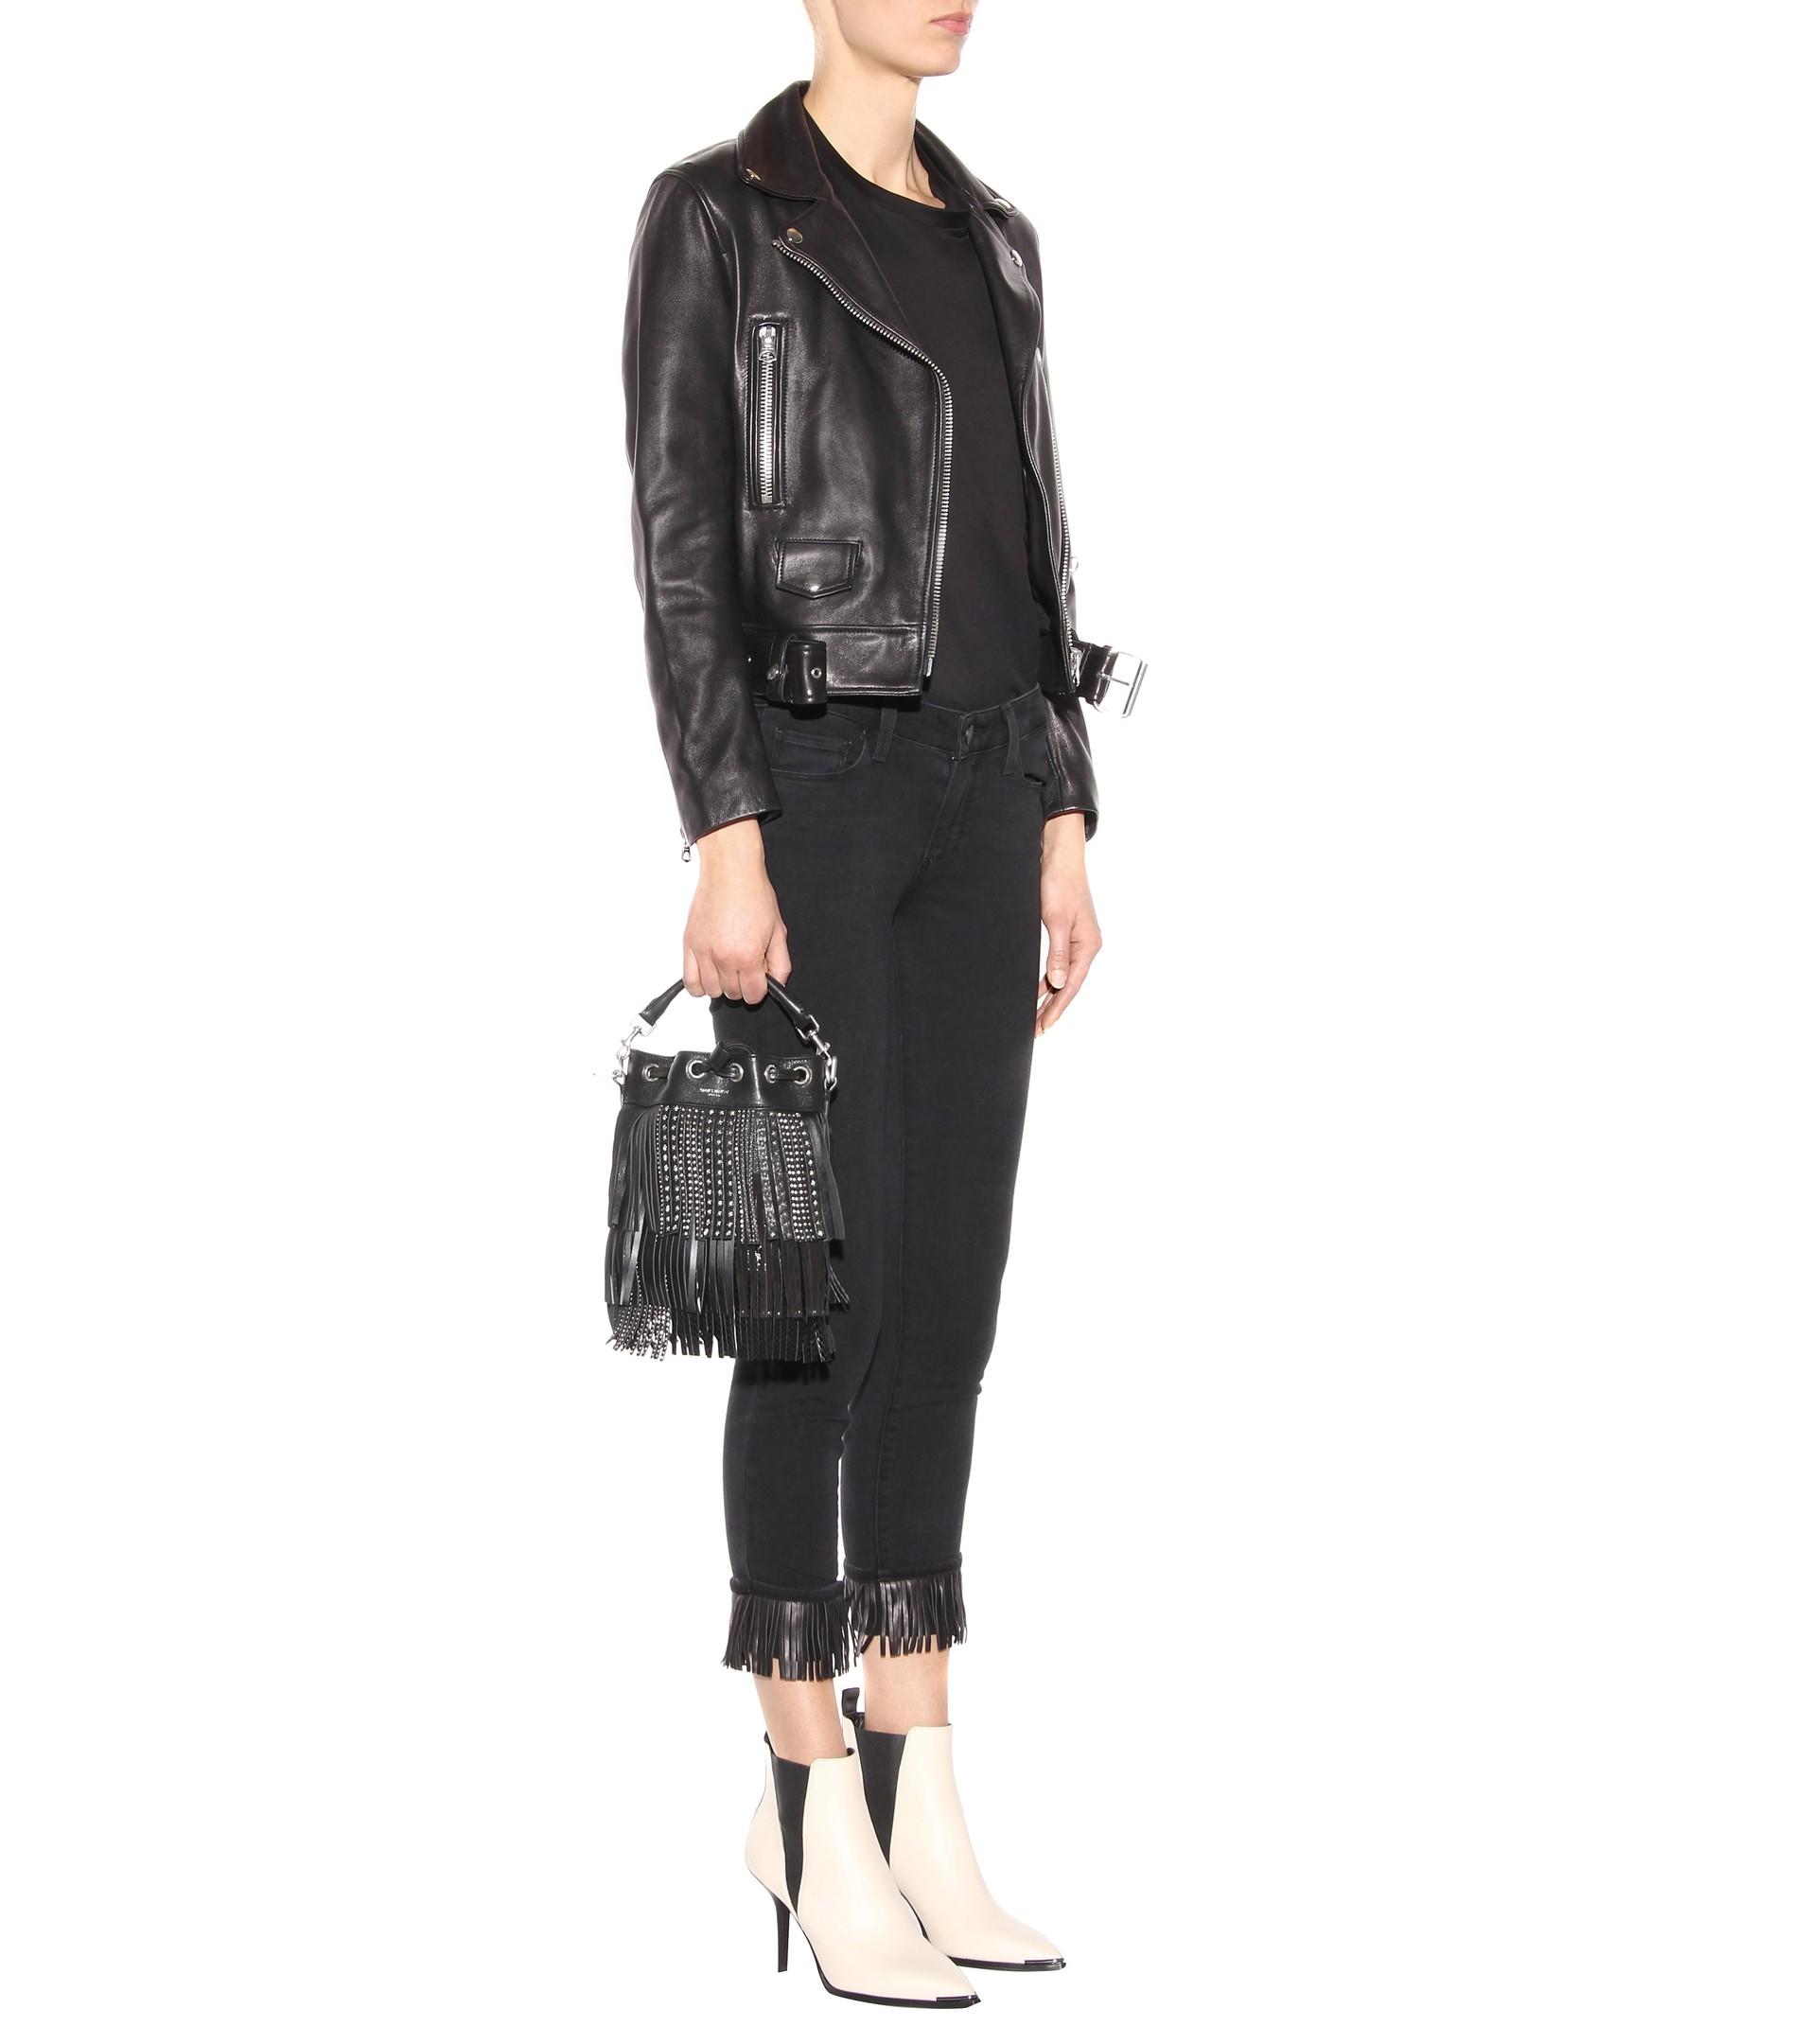 Acne Leather Jemma Booties in . nIjYJ